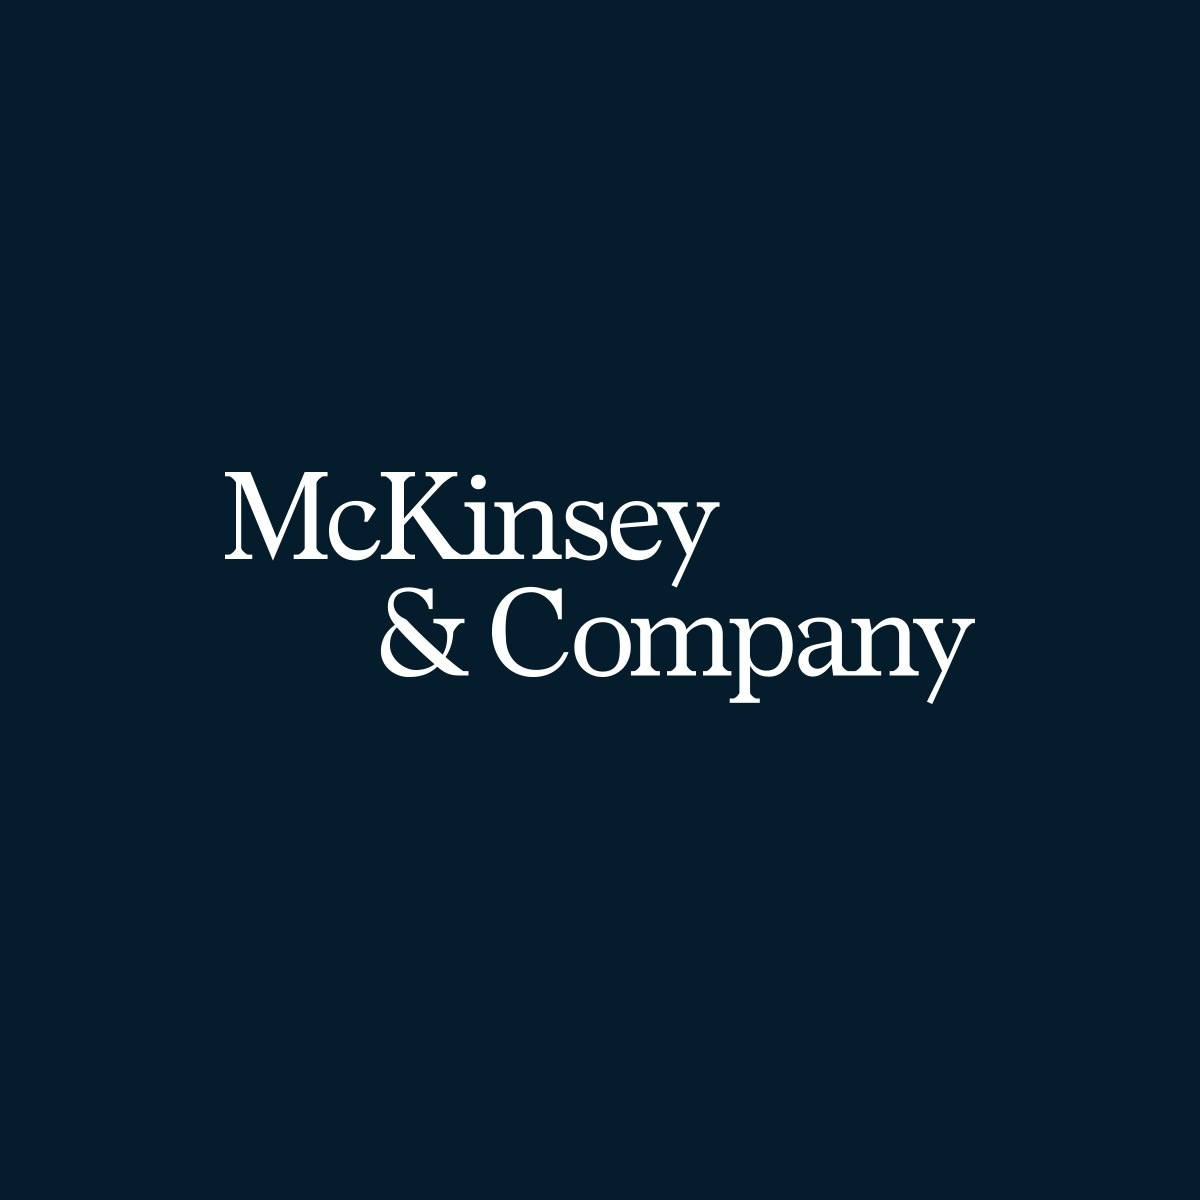 Mc Kinsey